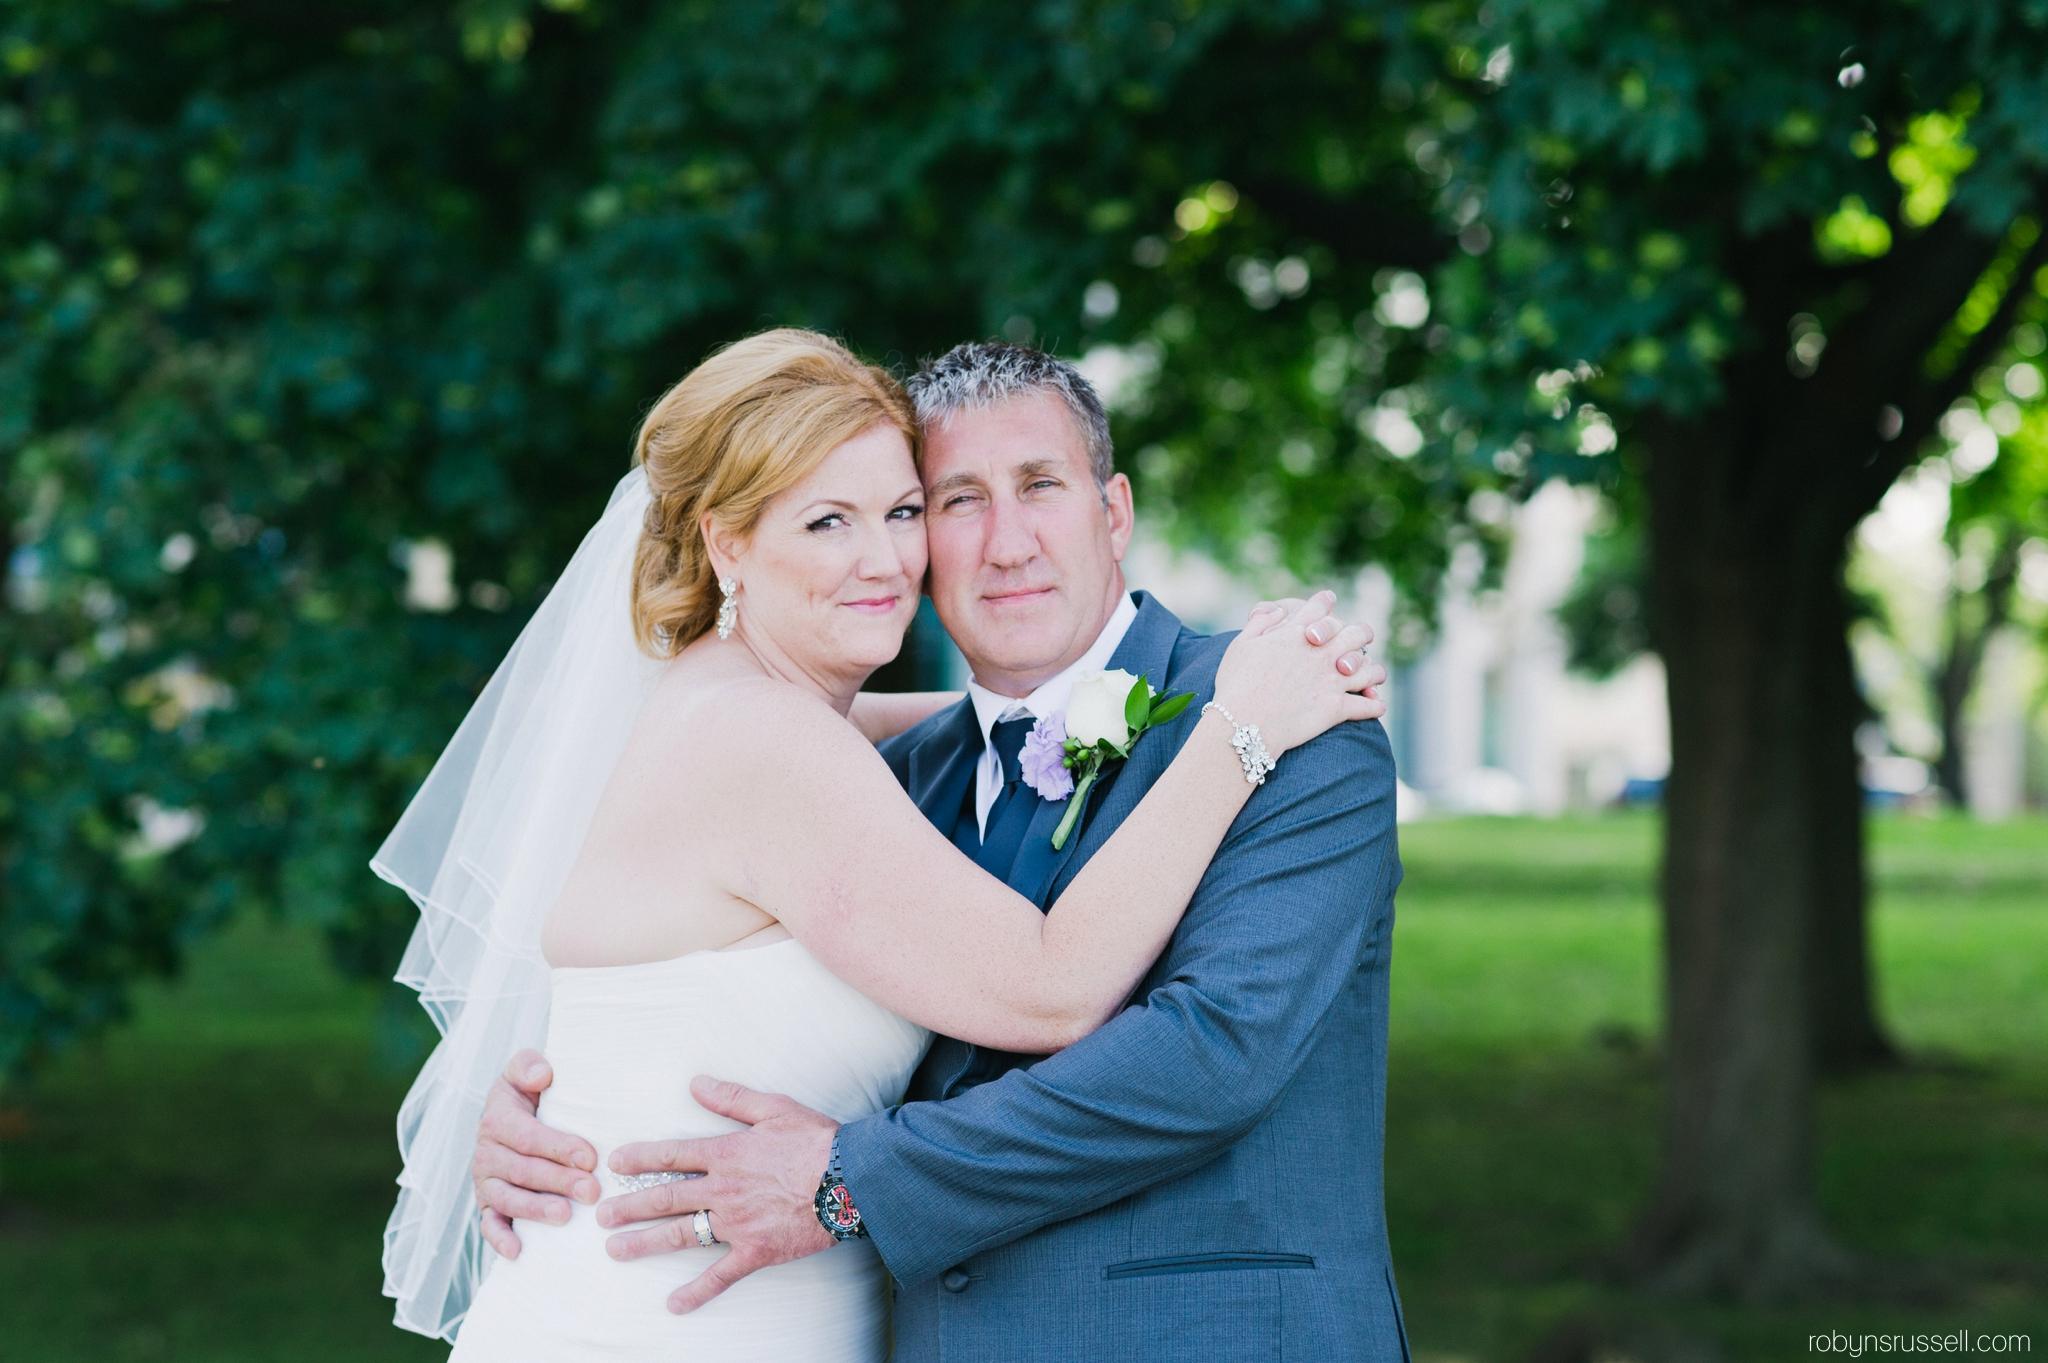 23-bride-and-groom-on-wedding-day-oakville-marina.jpg